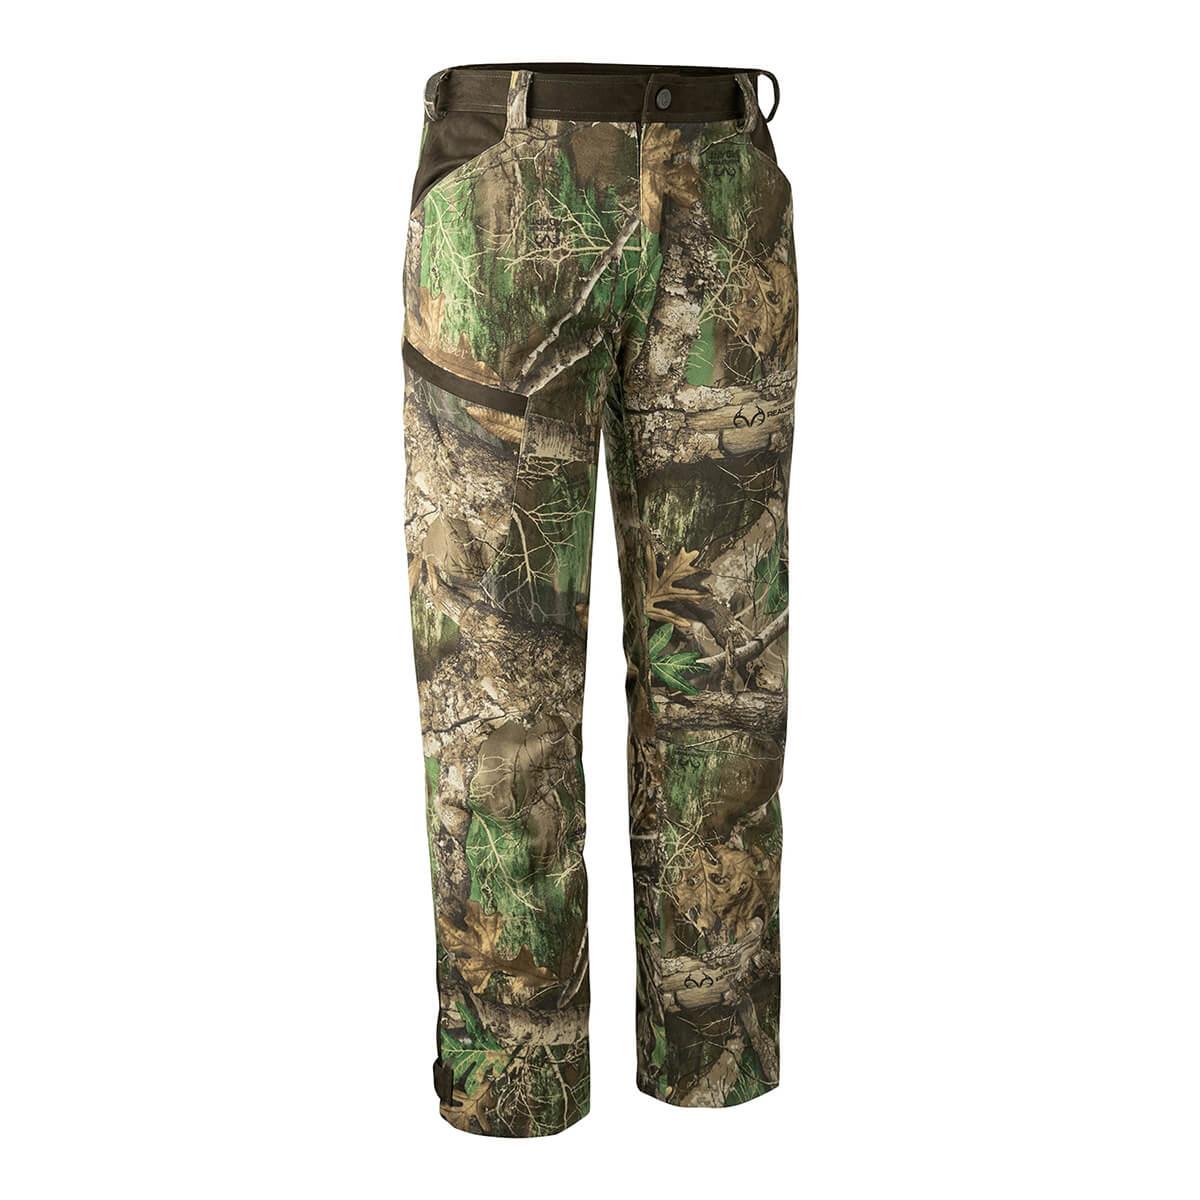 Deerhunter Jagdhose Explore (Realtree Adapt) - Jagdbekleidung Herren